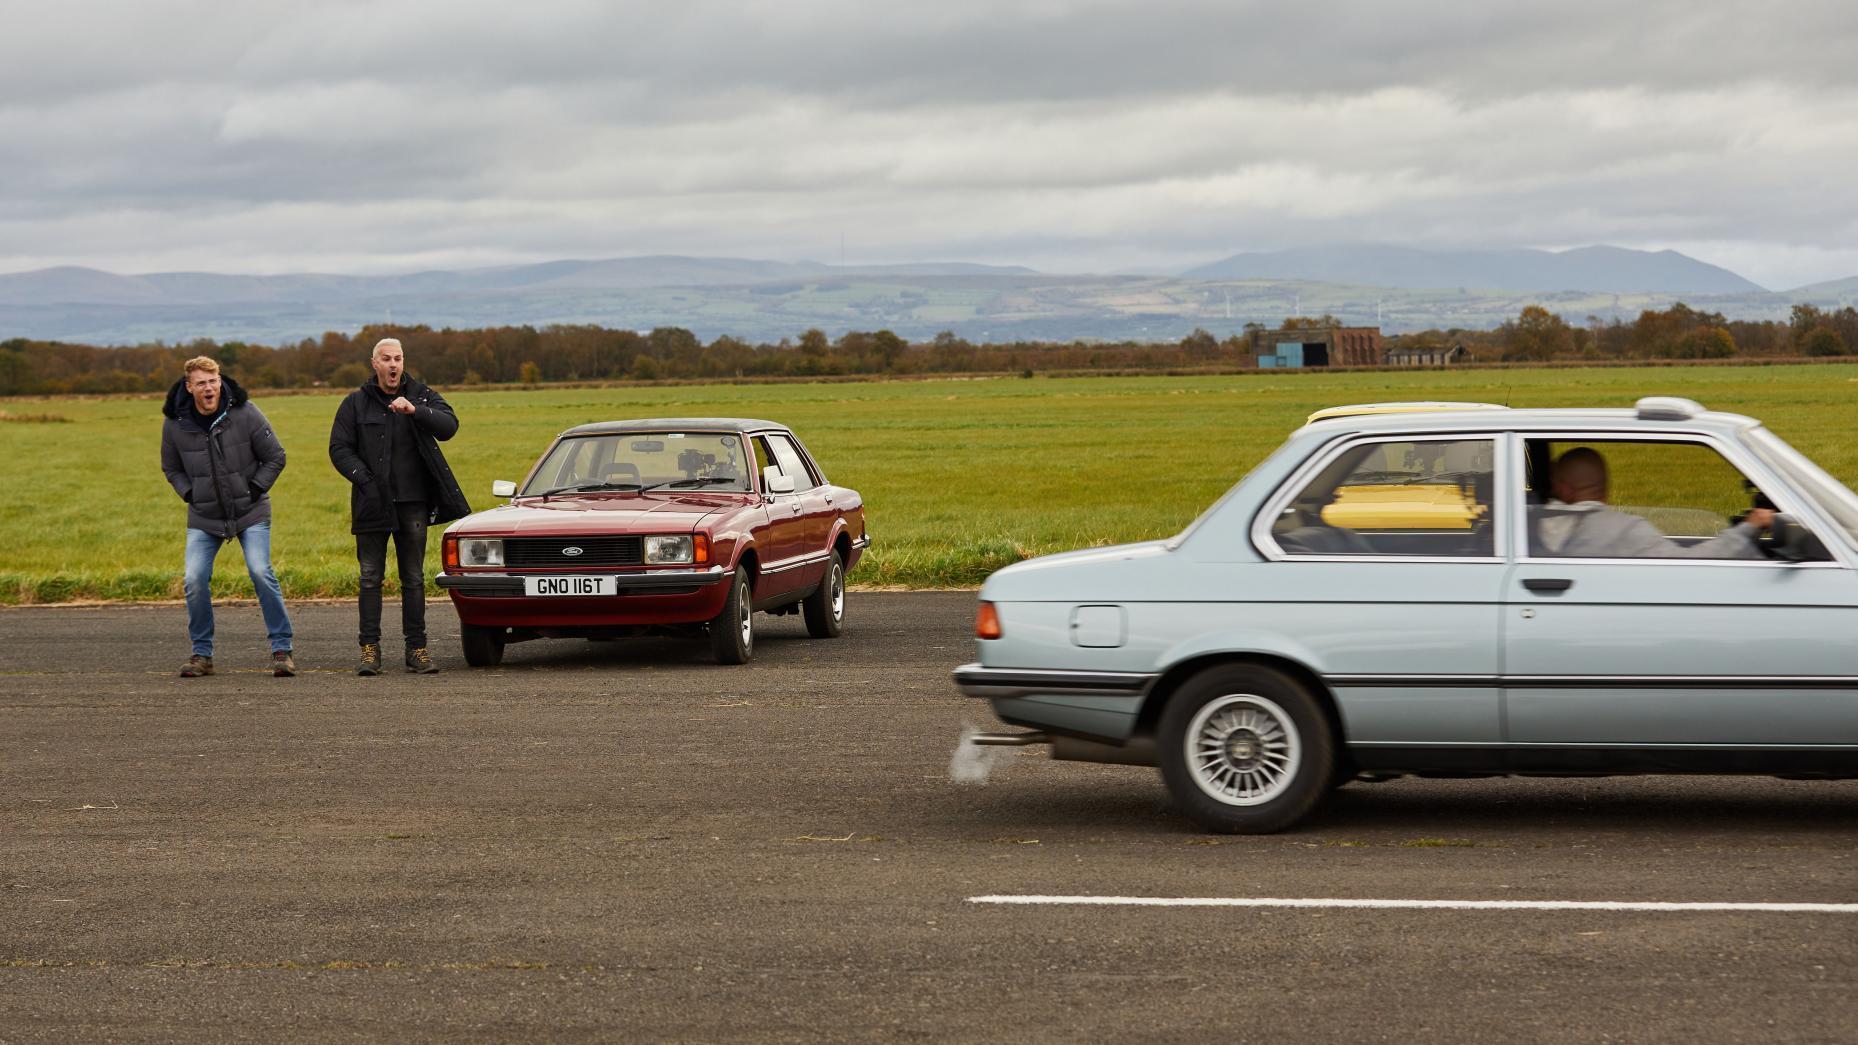 Ford Cortina en BMW 323i E21 (3-serie)